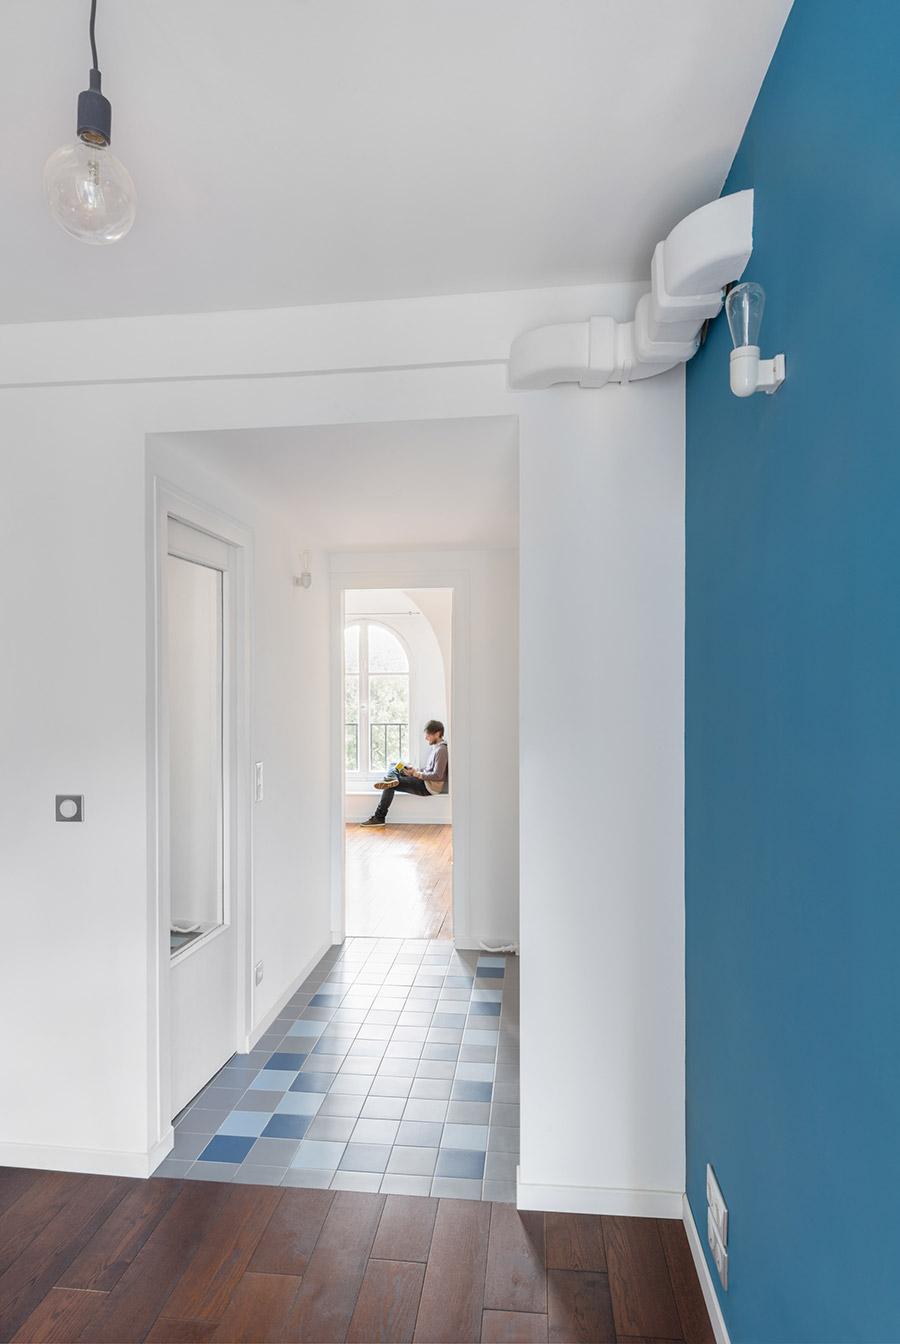 Hall Photo © Alexandra De Cossette (http://alexandradecossette.com)